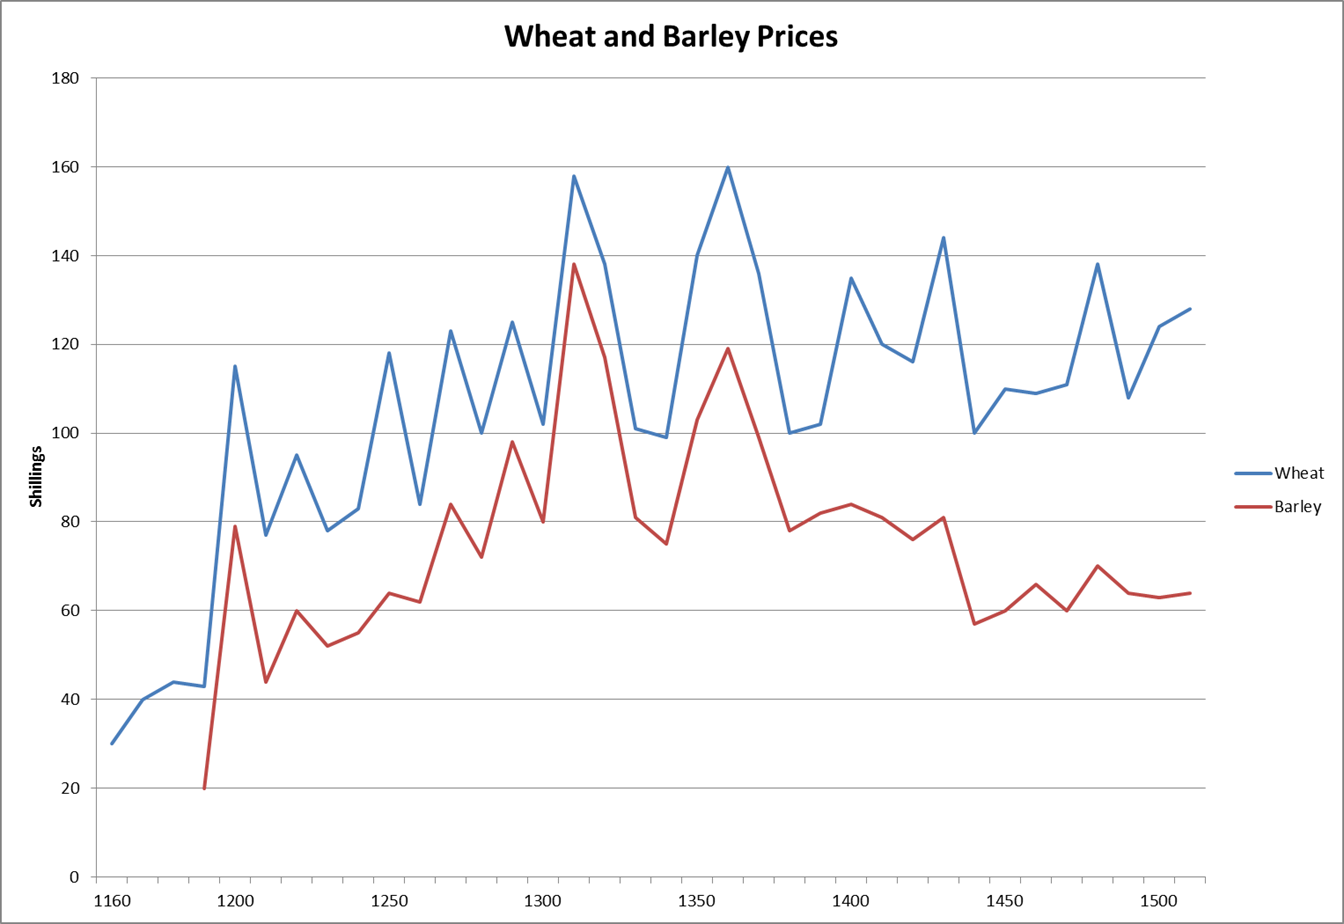 Grain prices 1150-1500